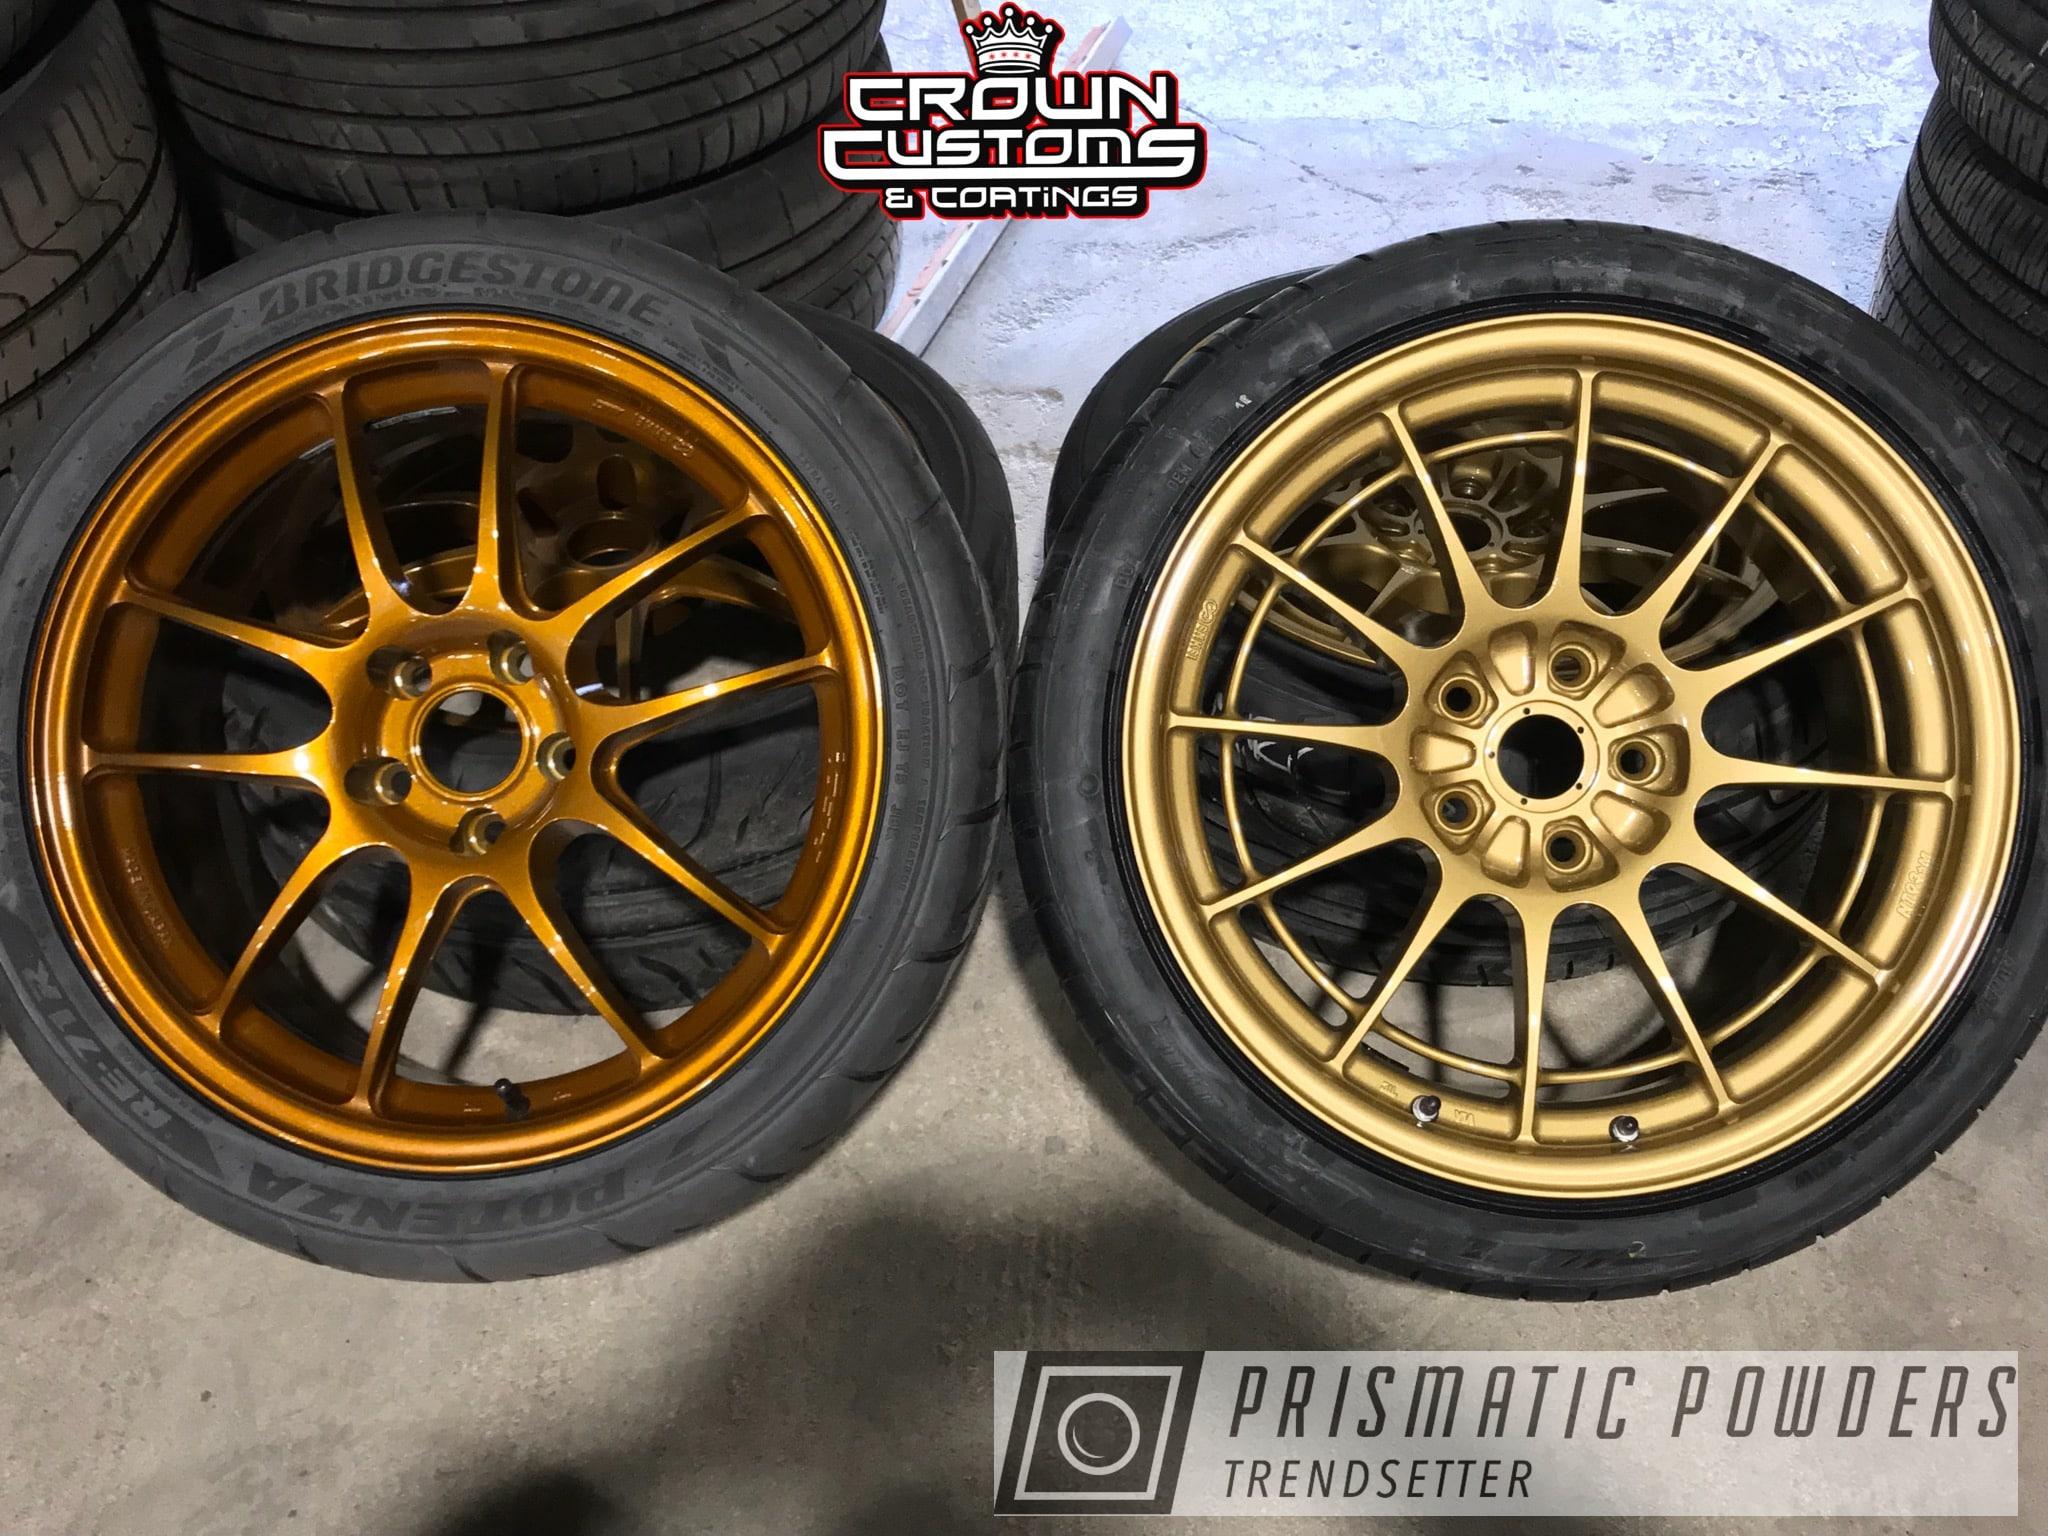 Powder Coating: Wheels,Enkei Wheels,Clear Vision PPS-2974,Illusion Spanish Fly PMB-6920,Spanish Gold EMS-0940